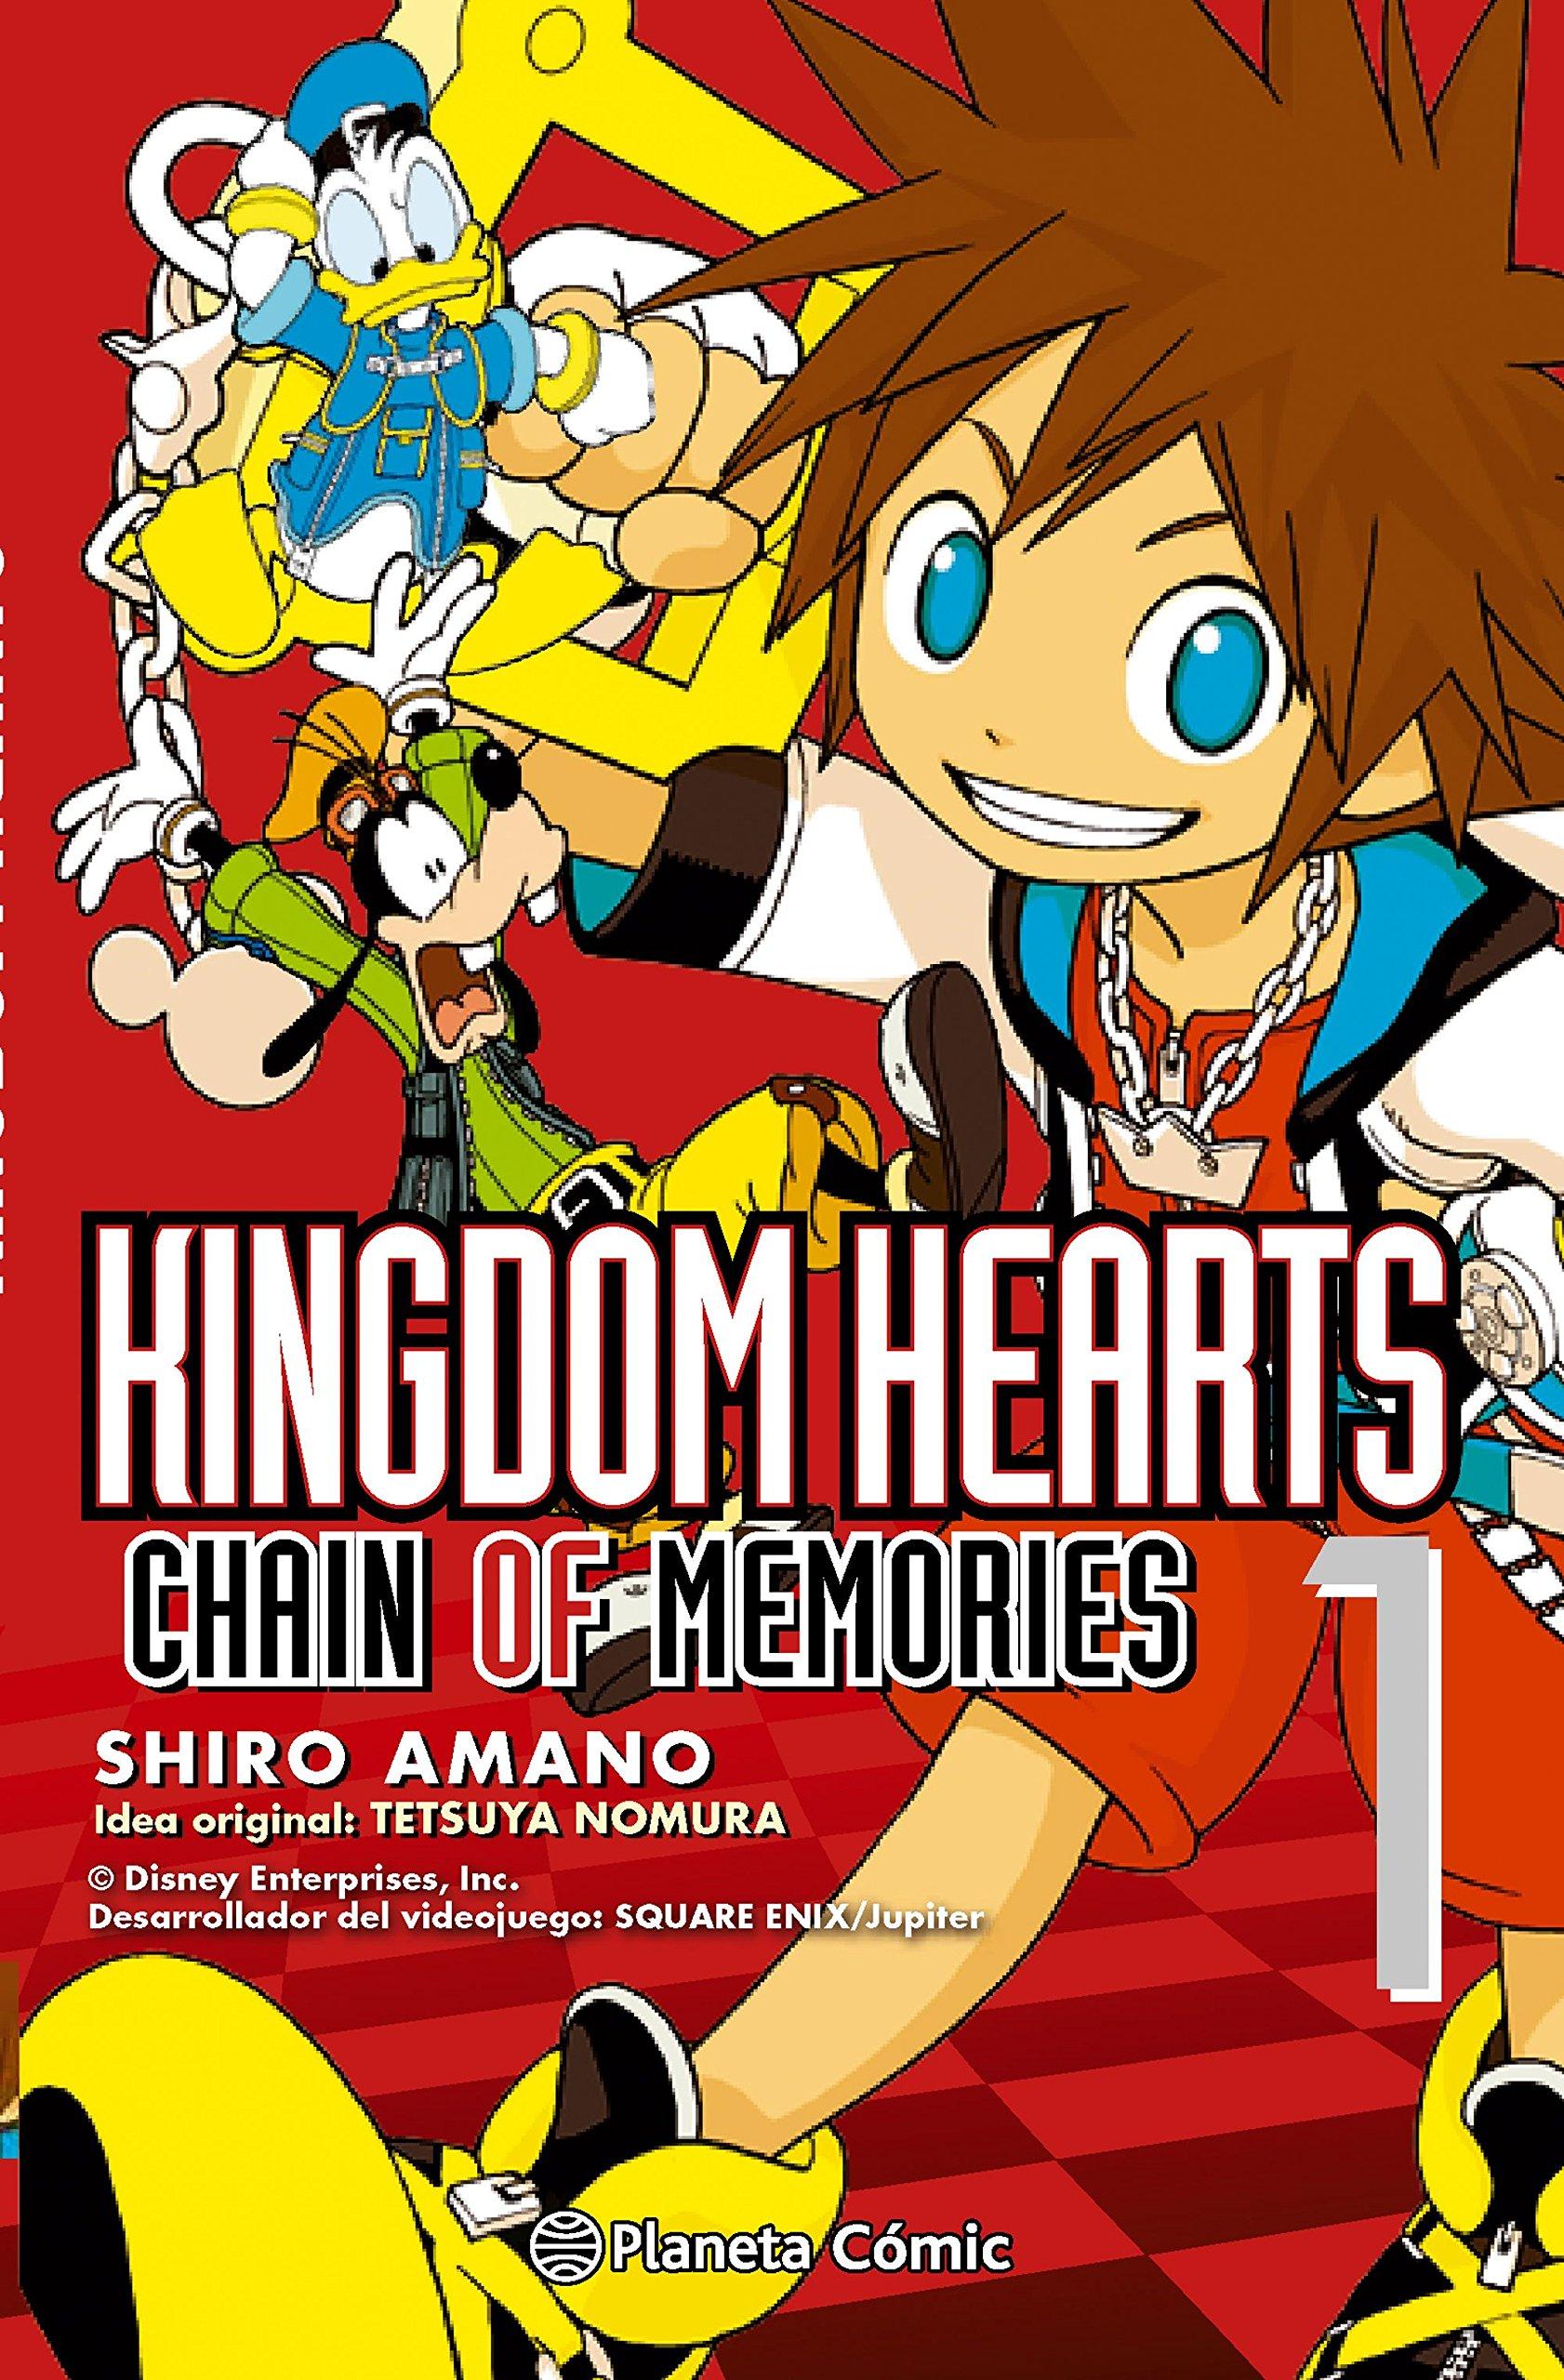 Kingdom Hearts, Chain of memories 1 (Manga Shonen, Band 190)